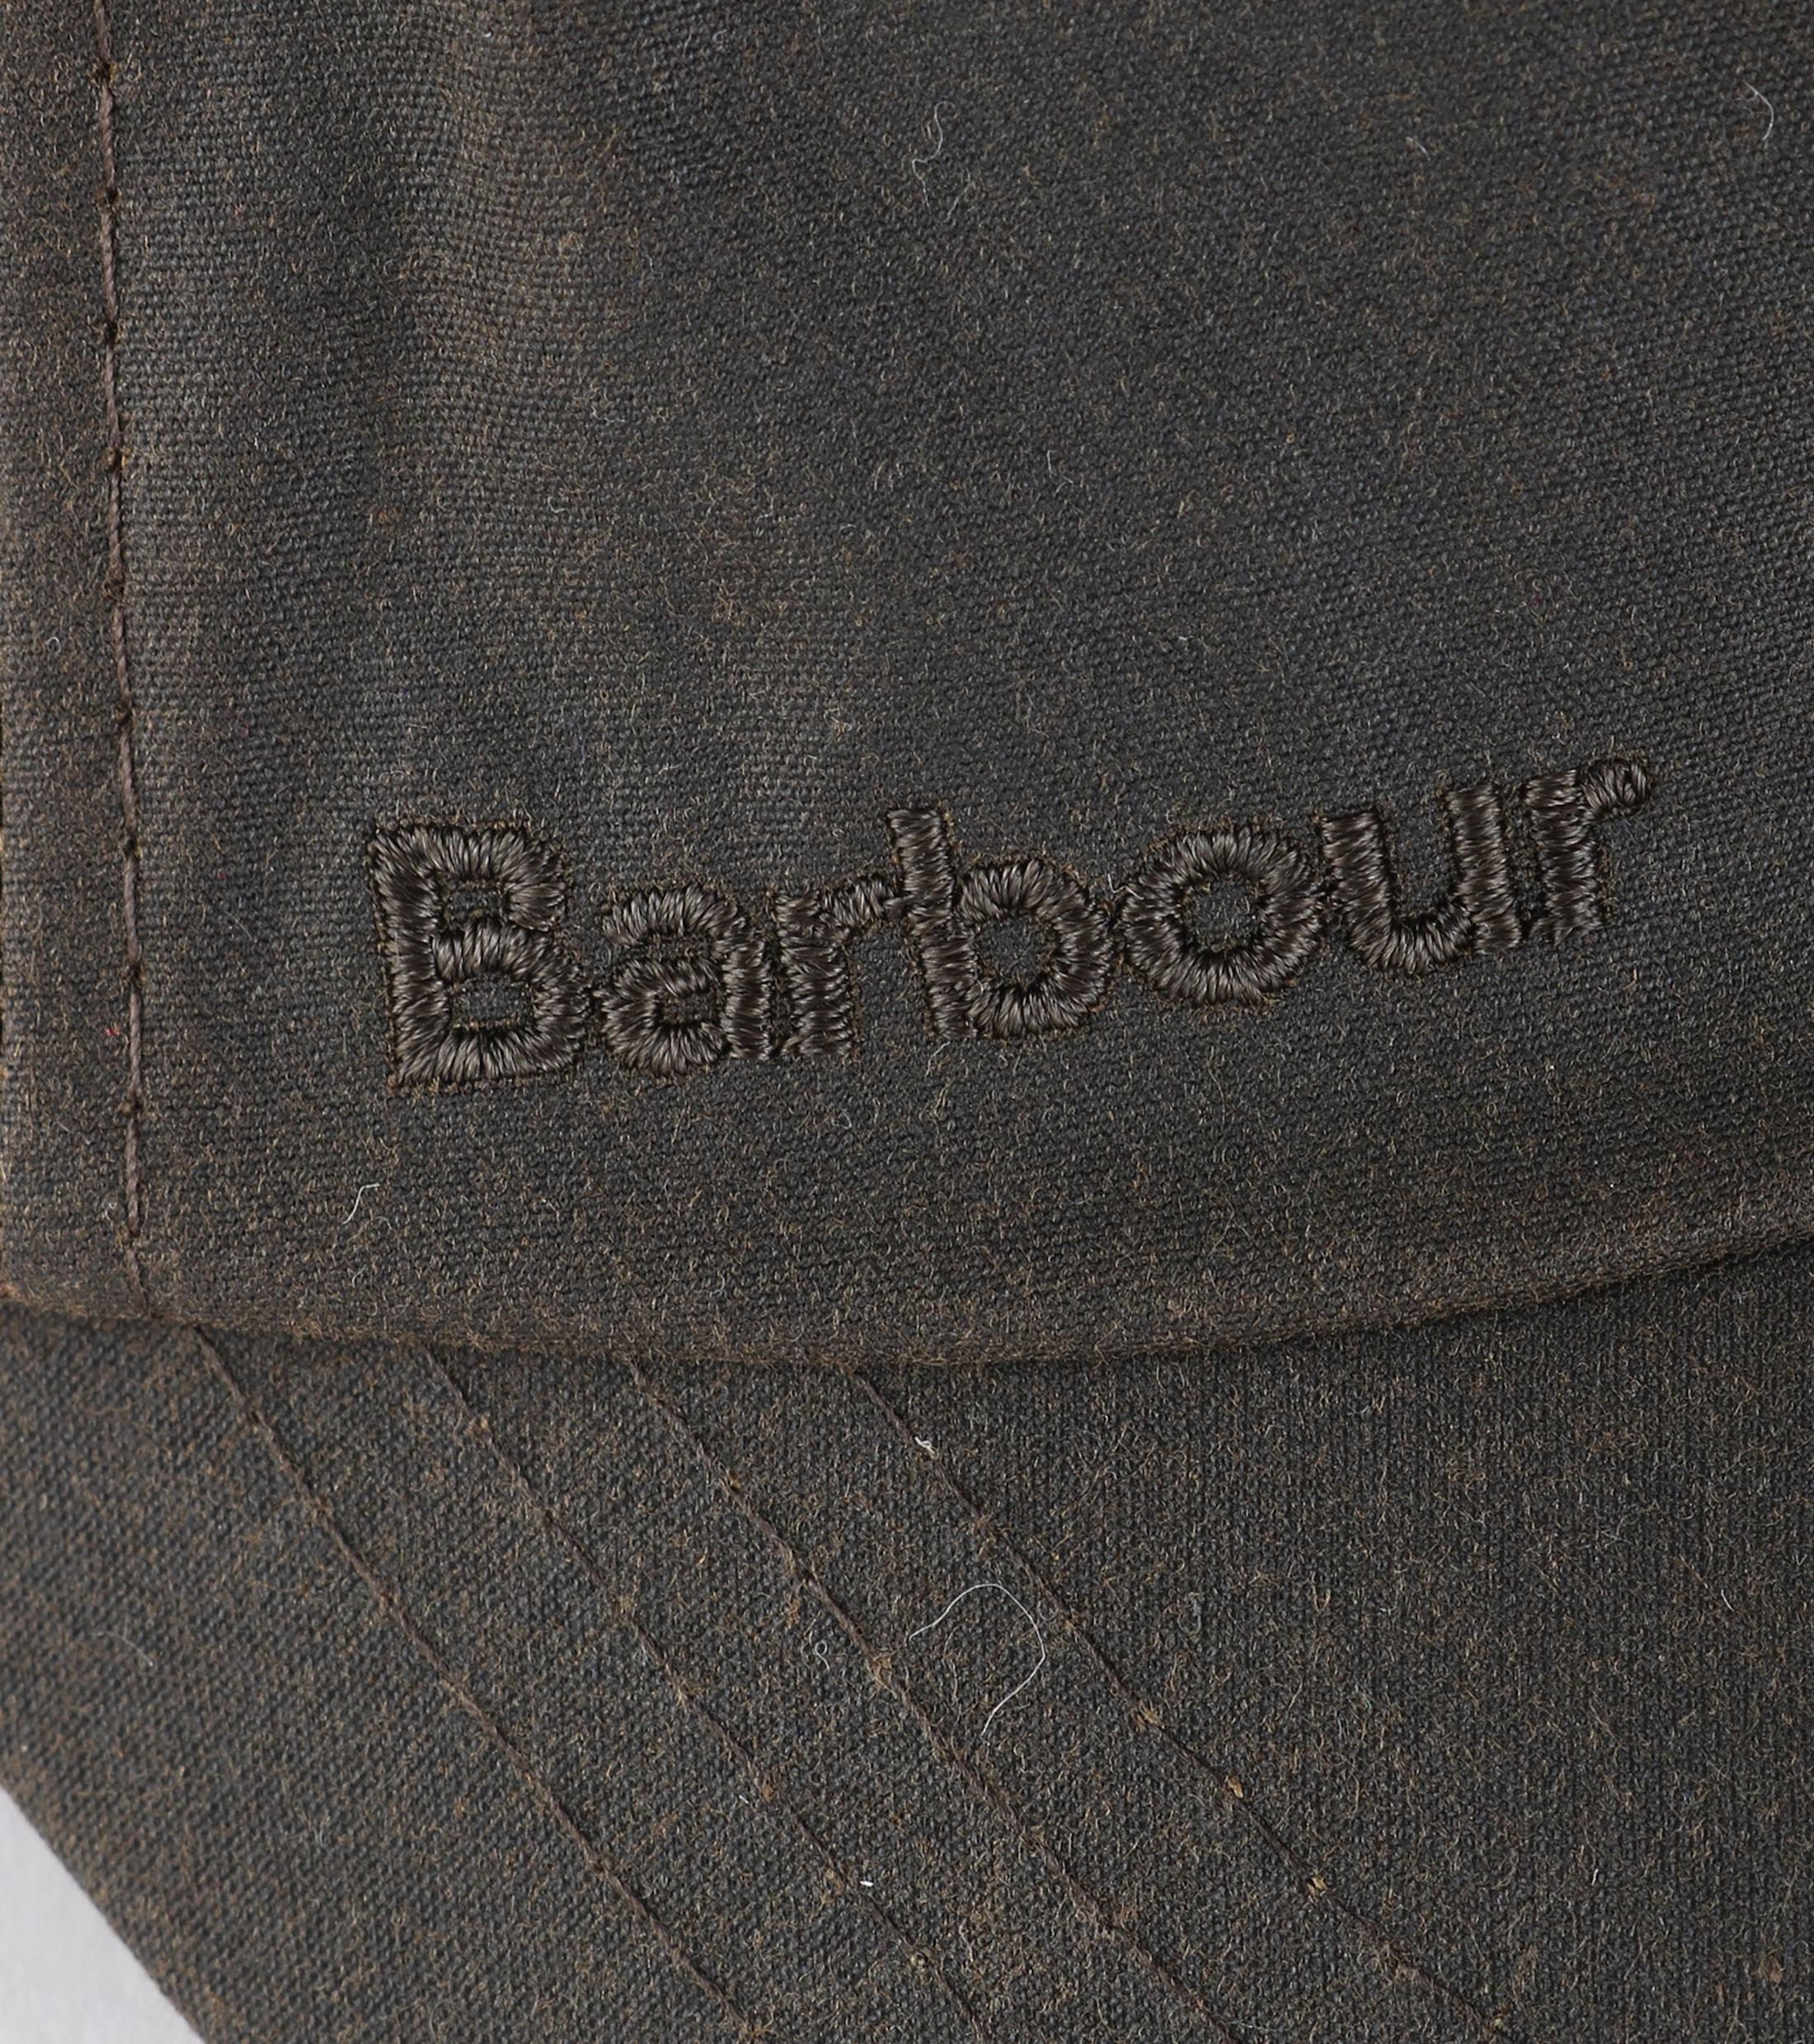 Barbour Wax Cap Olive photo 1